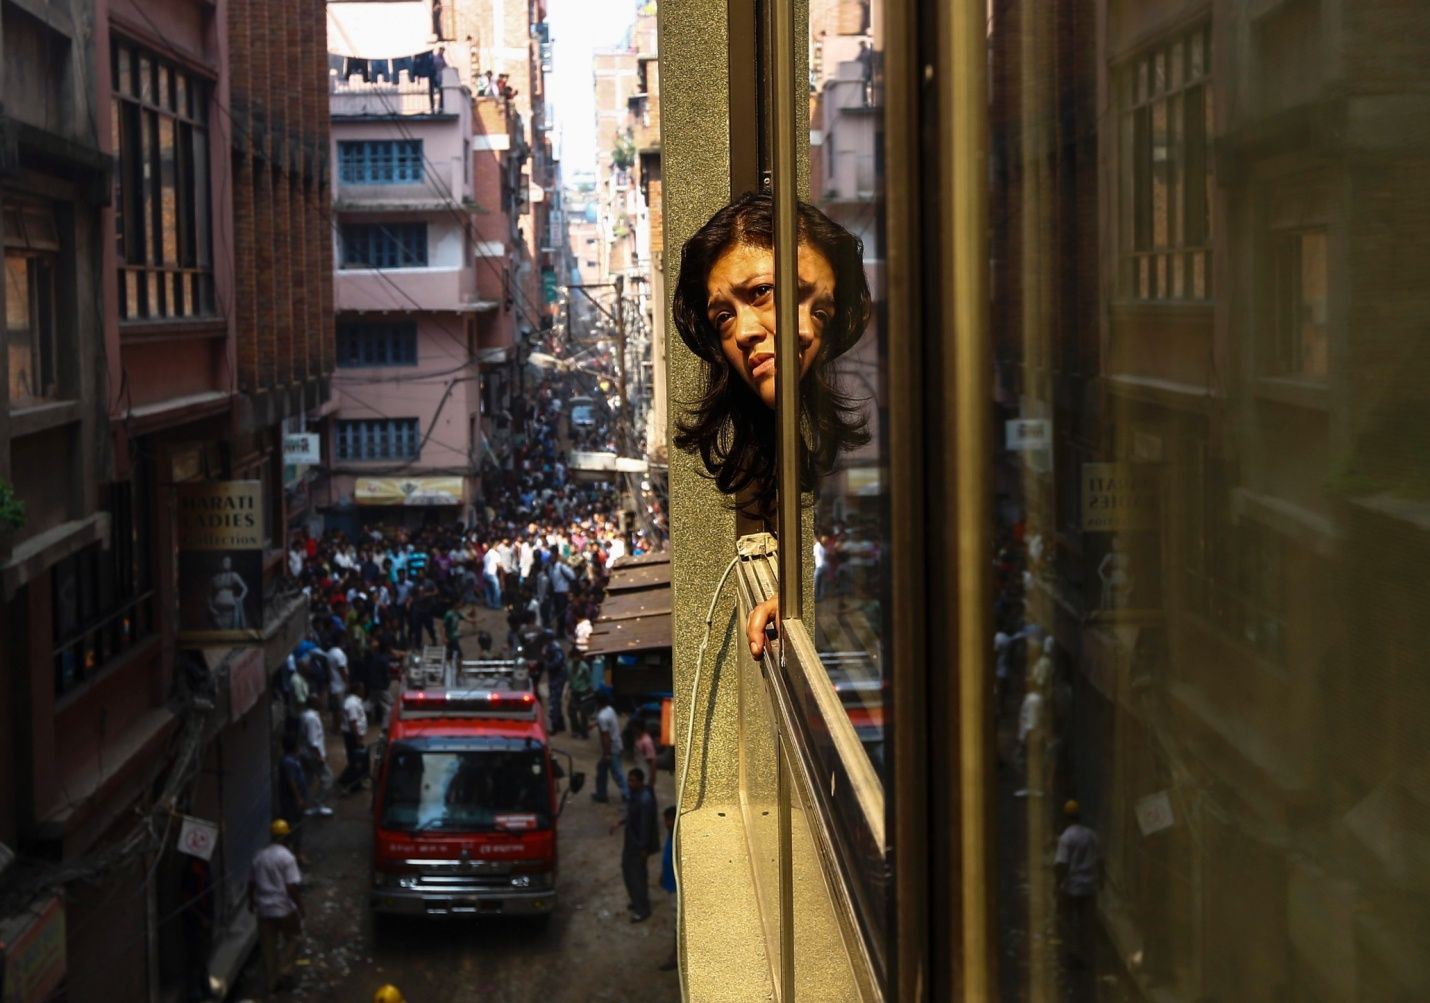 A woman watching firefighters from the window - Kathmandu, Nepal